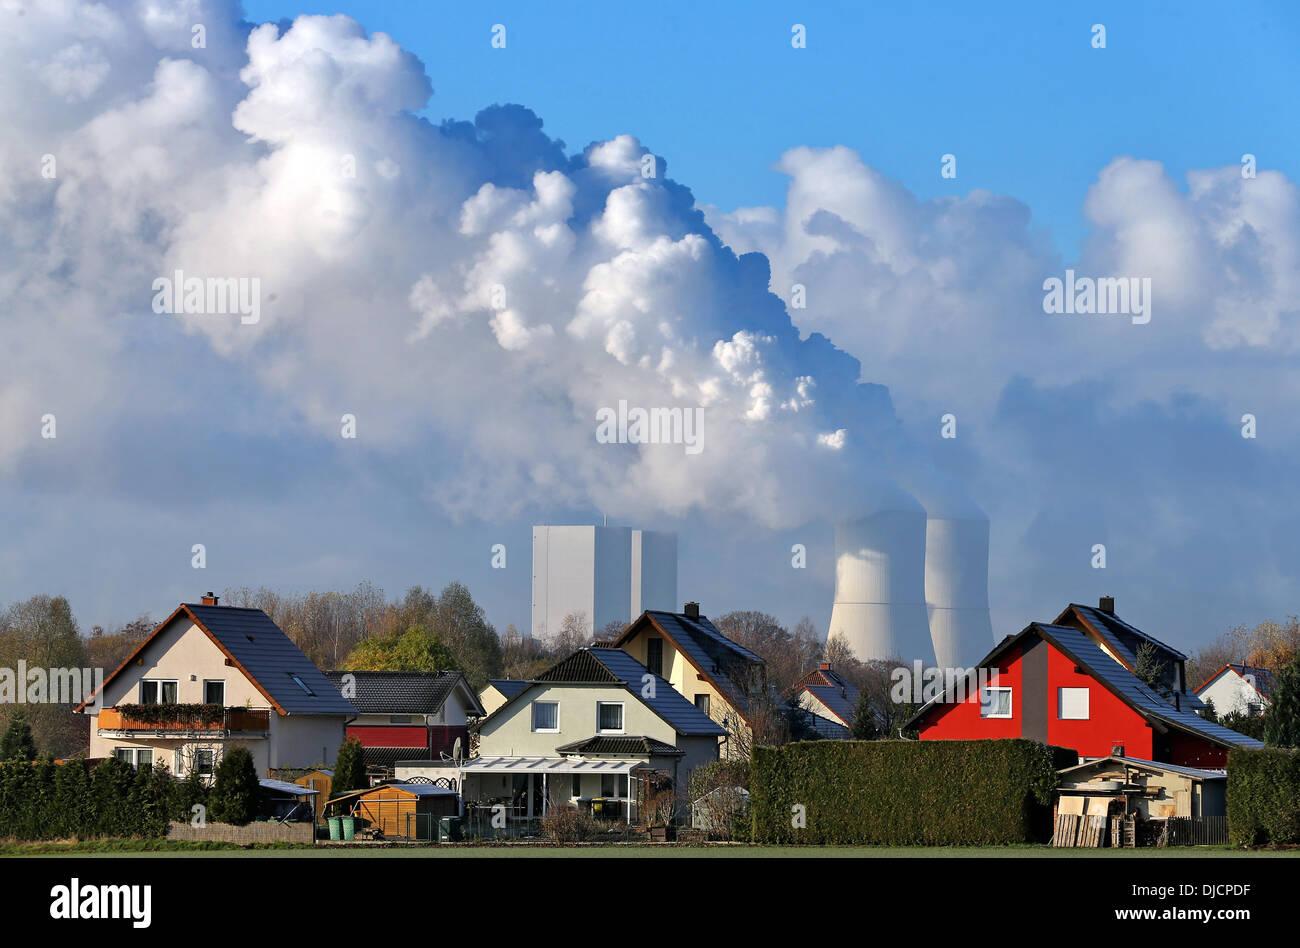 Lippendorf Power Plant Stockfotos & Lippendorf Power Plant Bilder ...